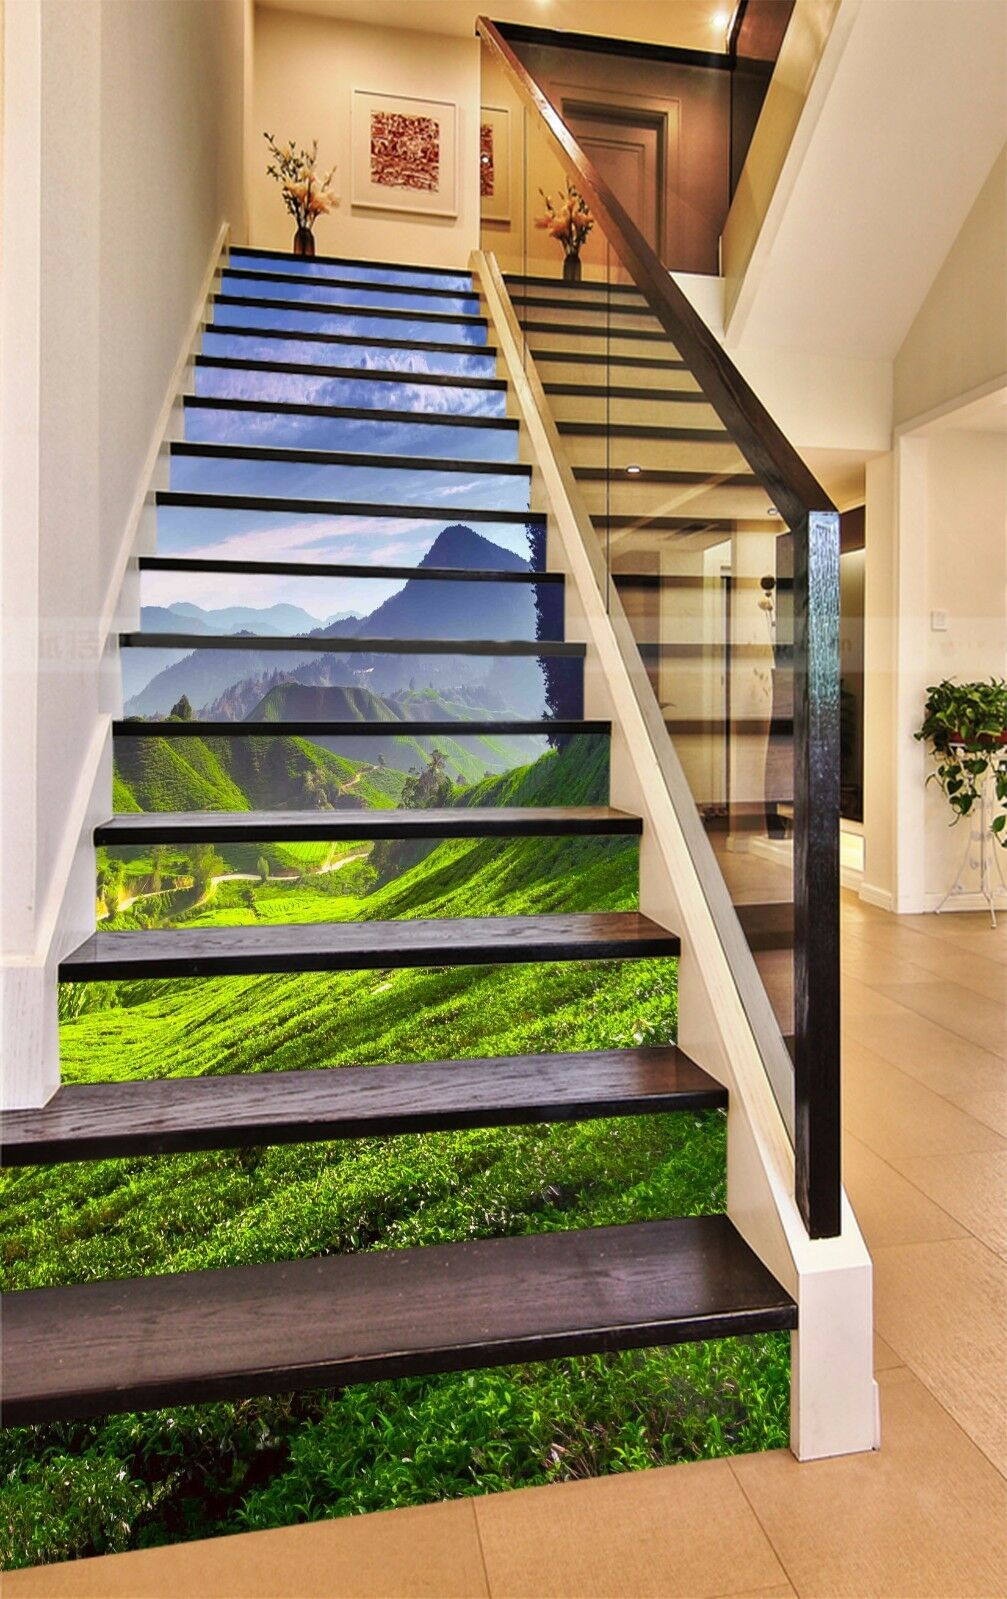 3D Tea Mountain 153 Stair Risers Decoration Photo Mural Vinyl Decal Wallpaper AU